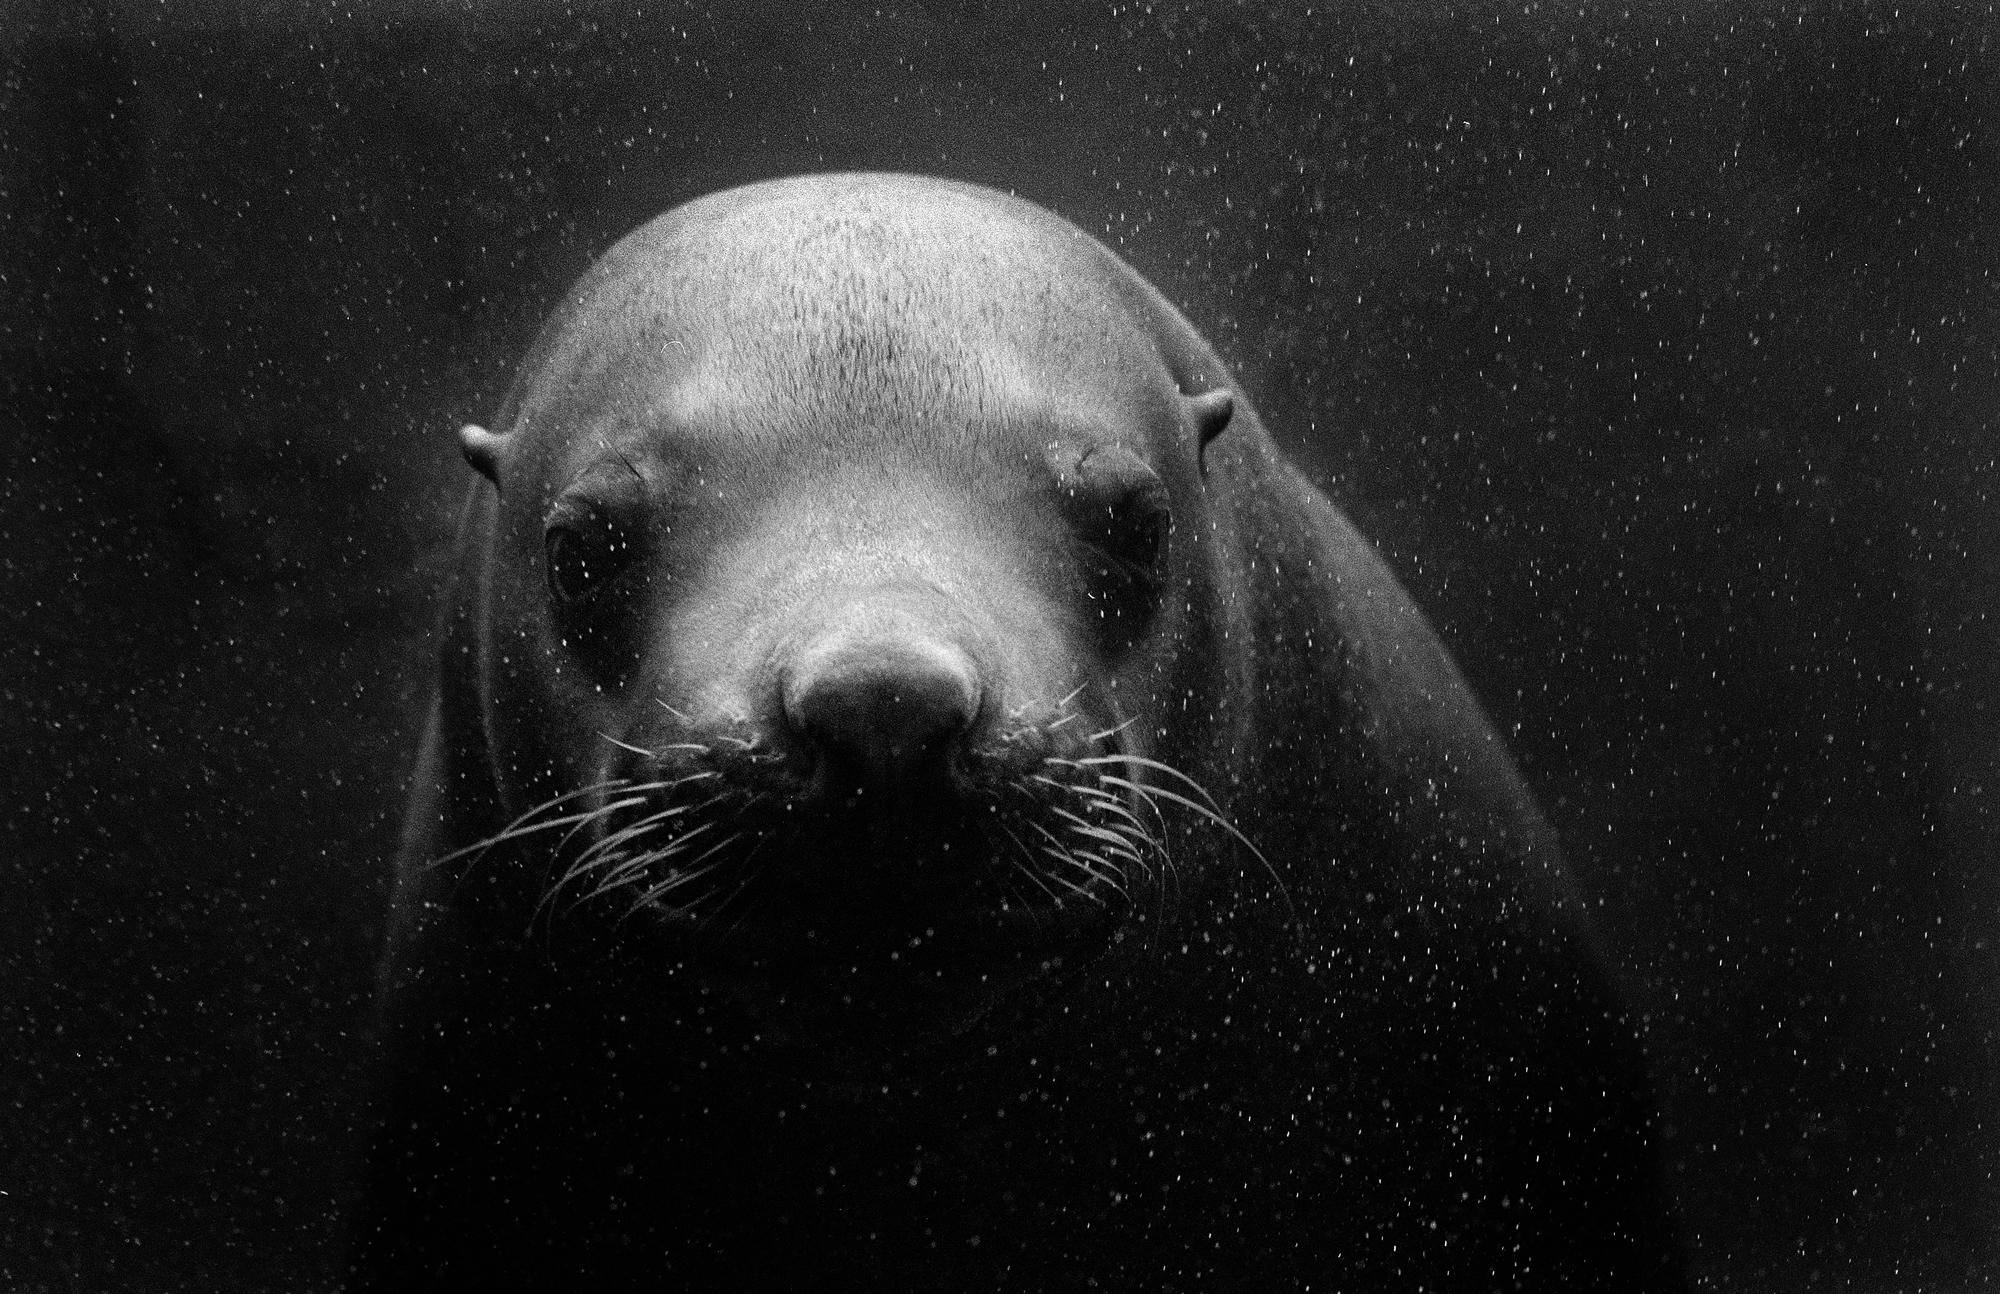 Stellar Sea Lion, Seward, Alaska 2001  Anchorage Museum Collection